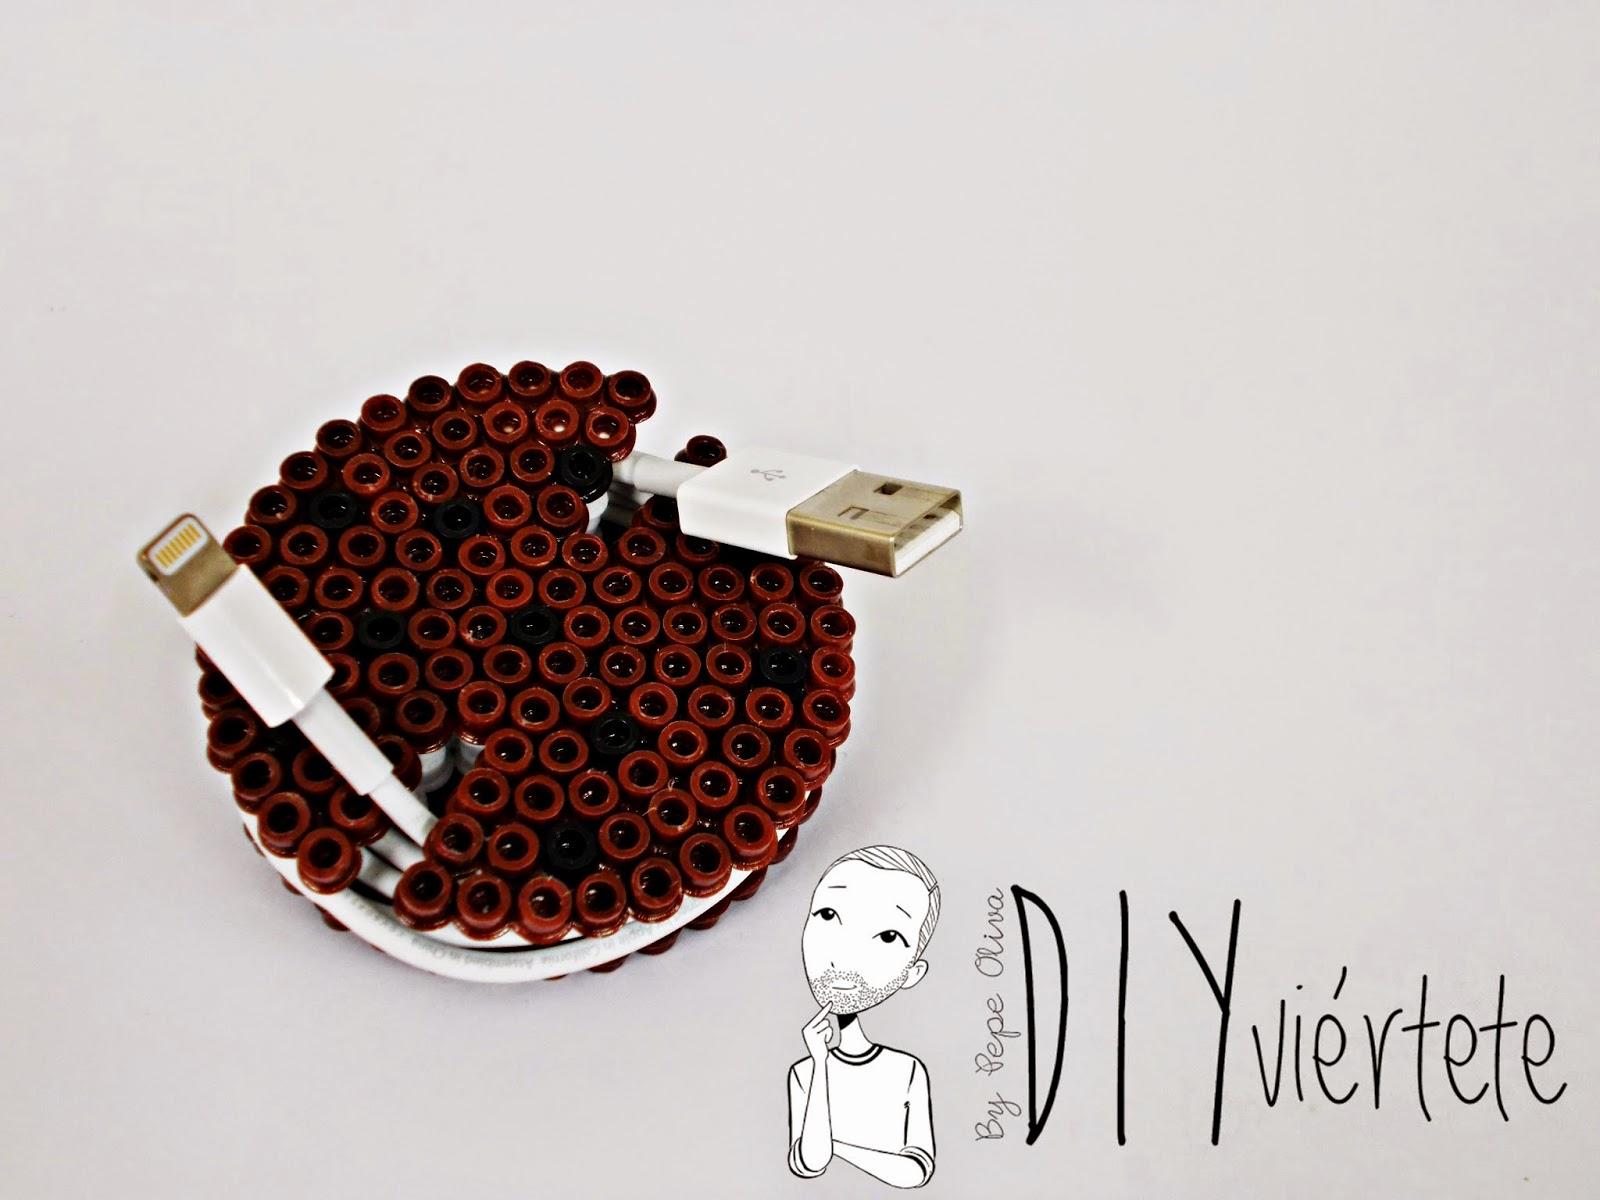 DIY-Hama Beads-ideas-galleta-cookie-guarda auriculares-cables-organizador-8